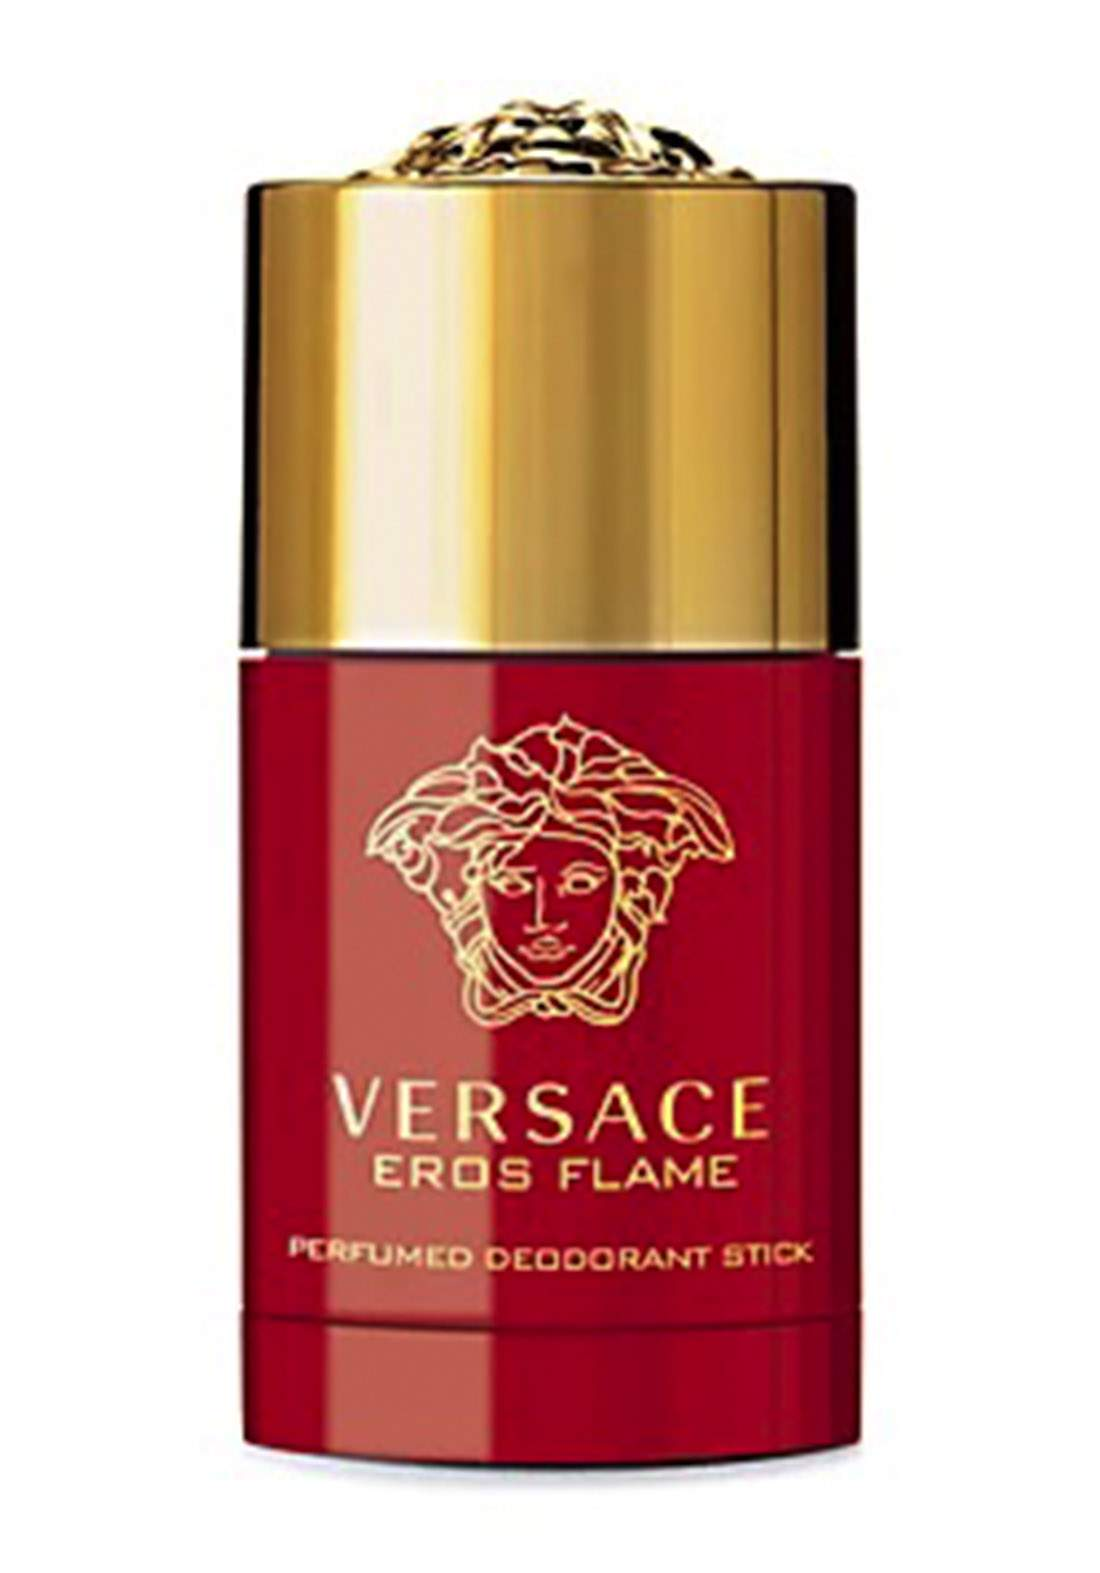 Versace Men's Eros Flame Deodorant Stick 75ml مزيل العرق للرجال